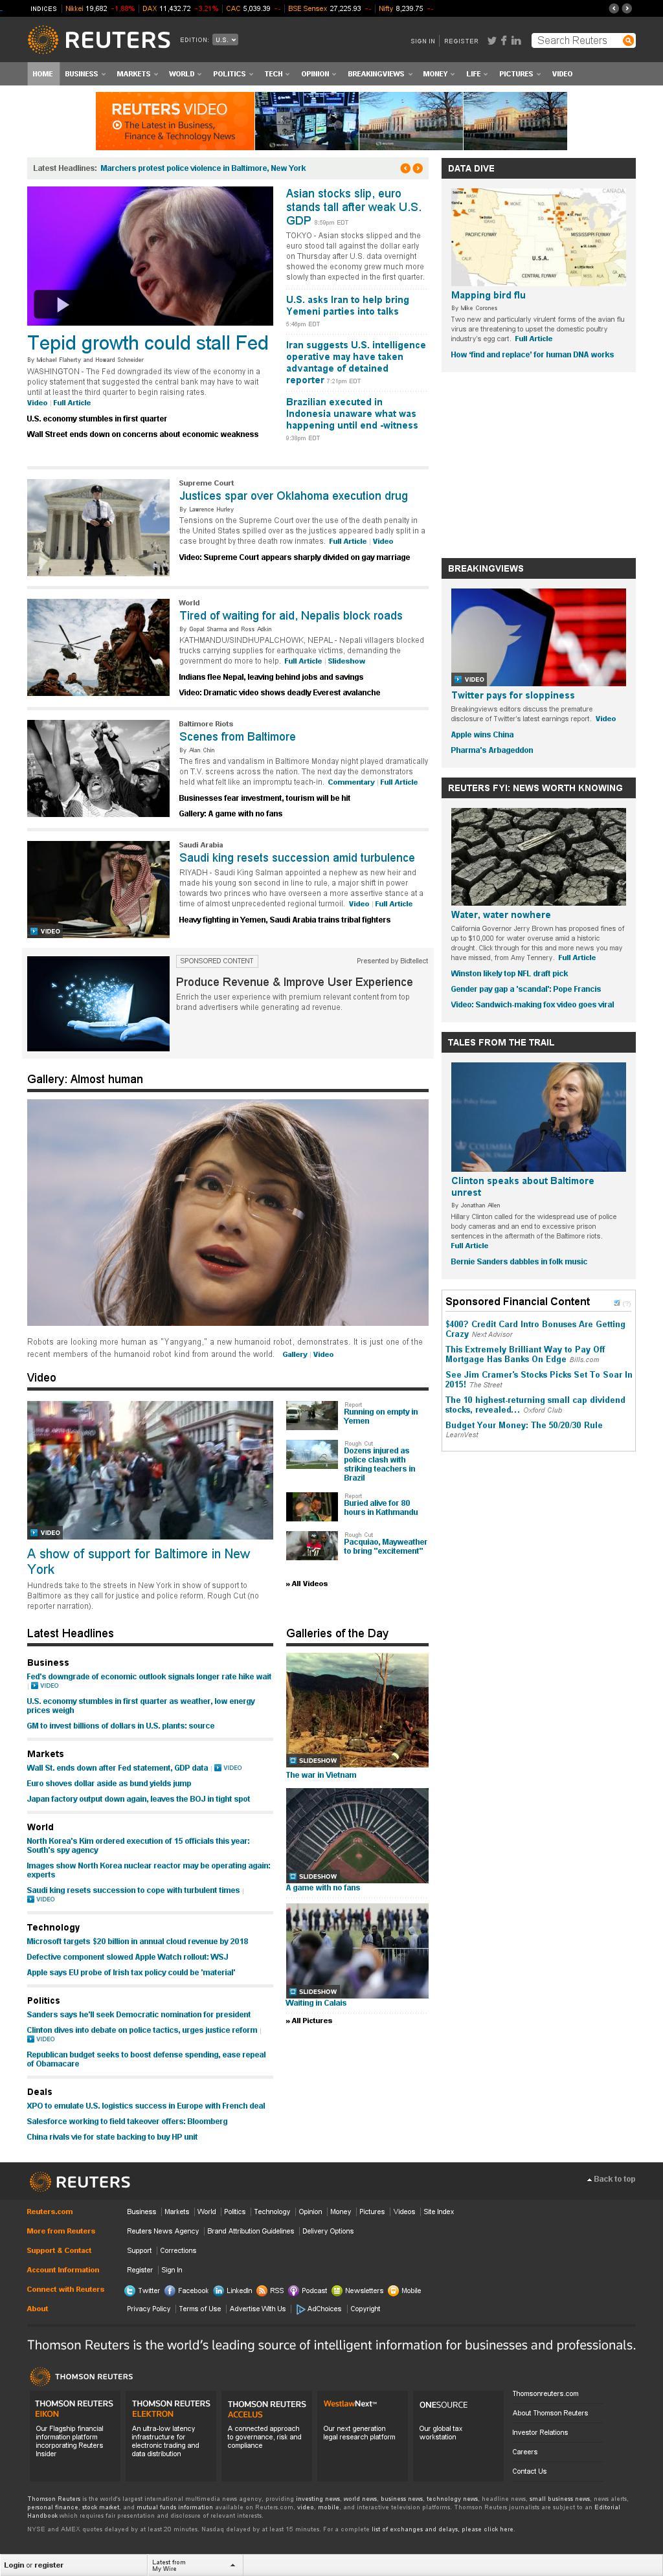 Reuters at Thursday April 30, 2015, 2:17 a.m. UTC